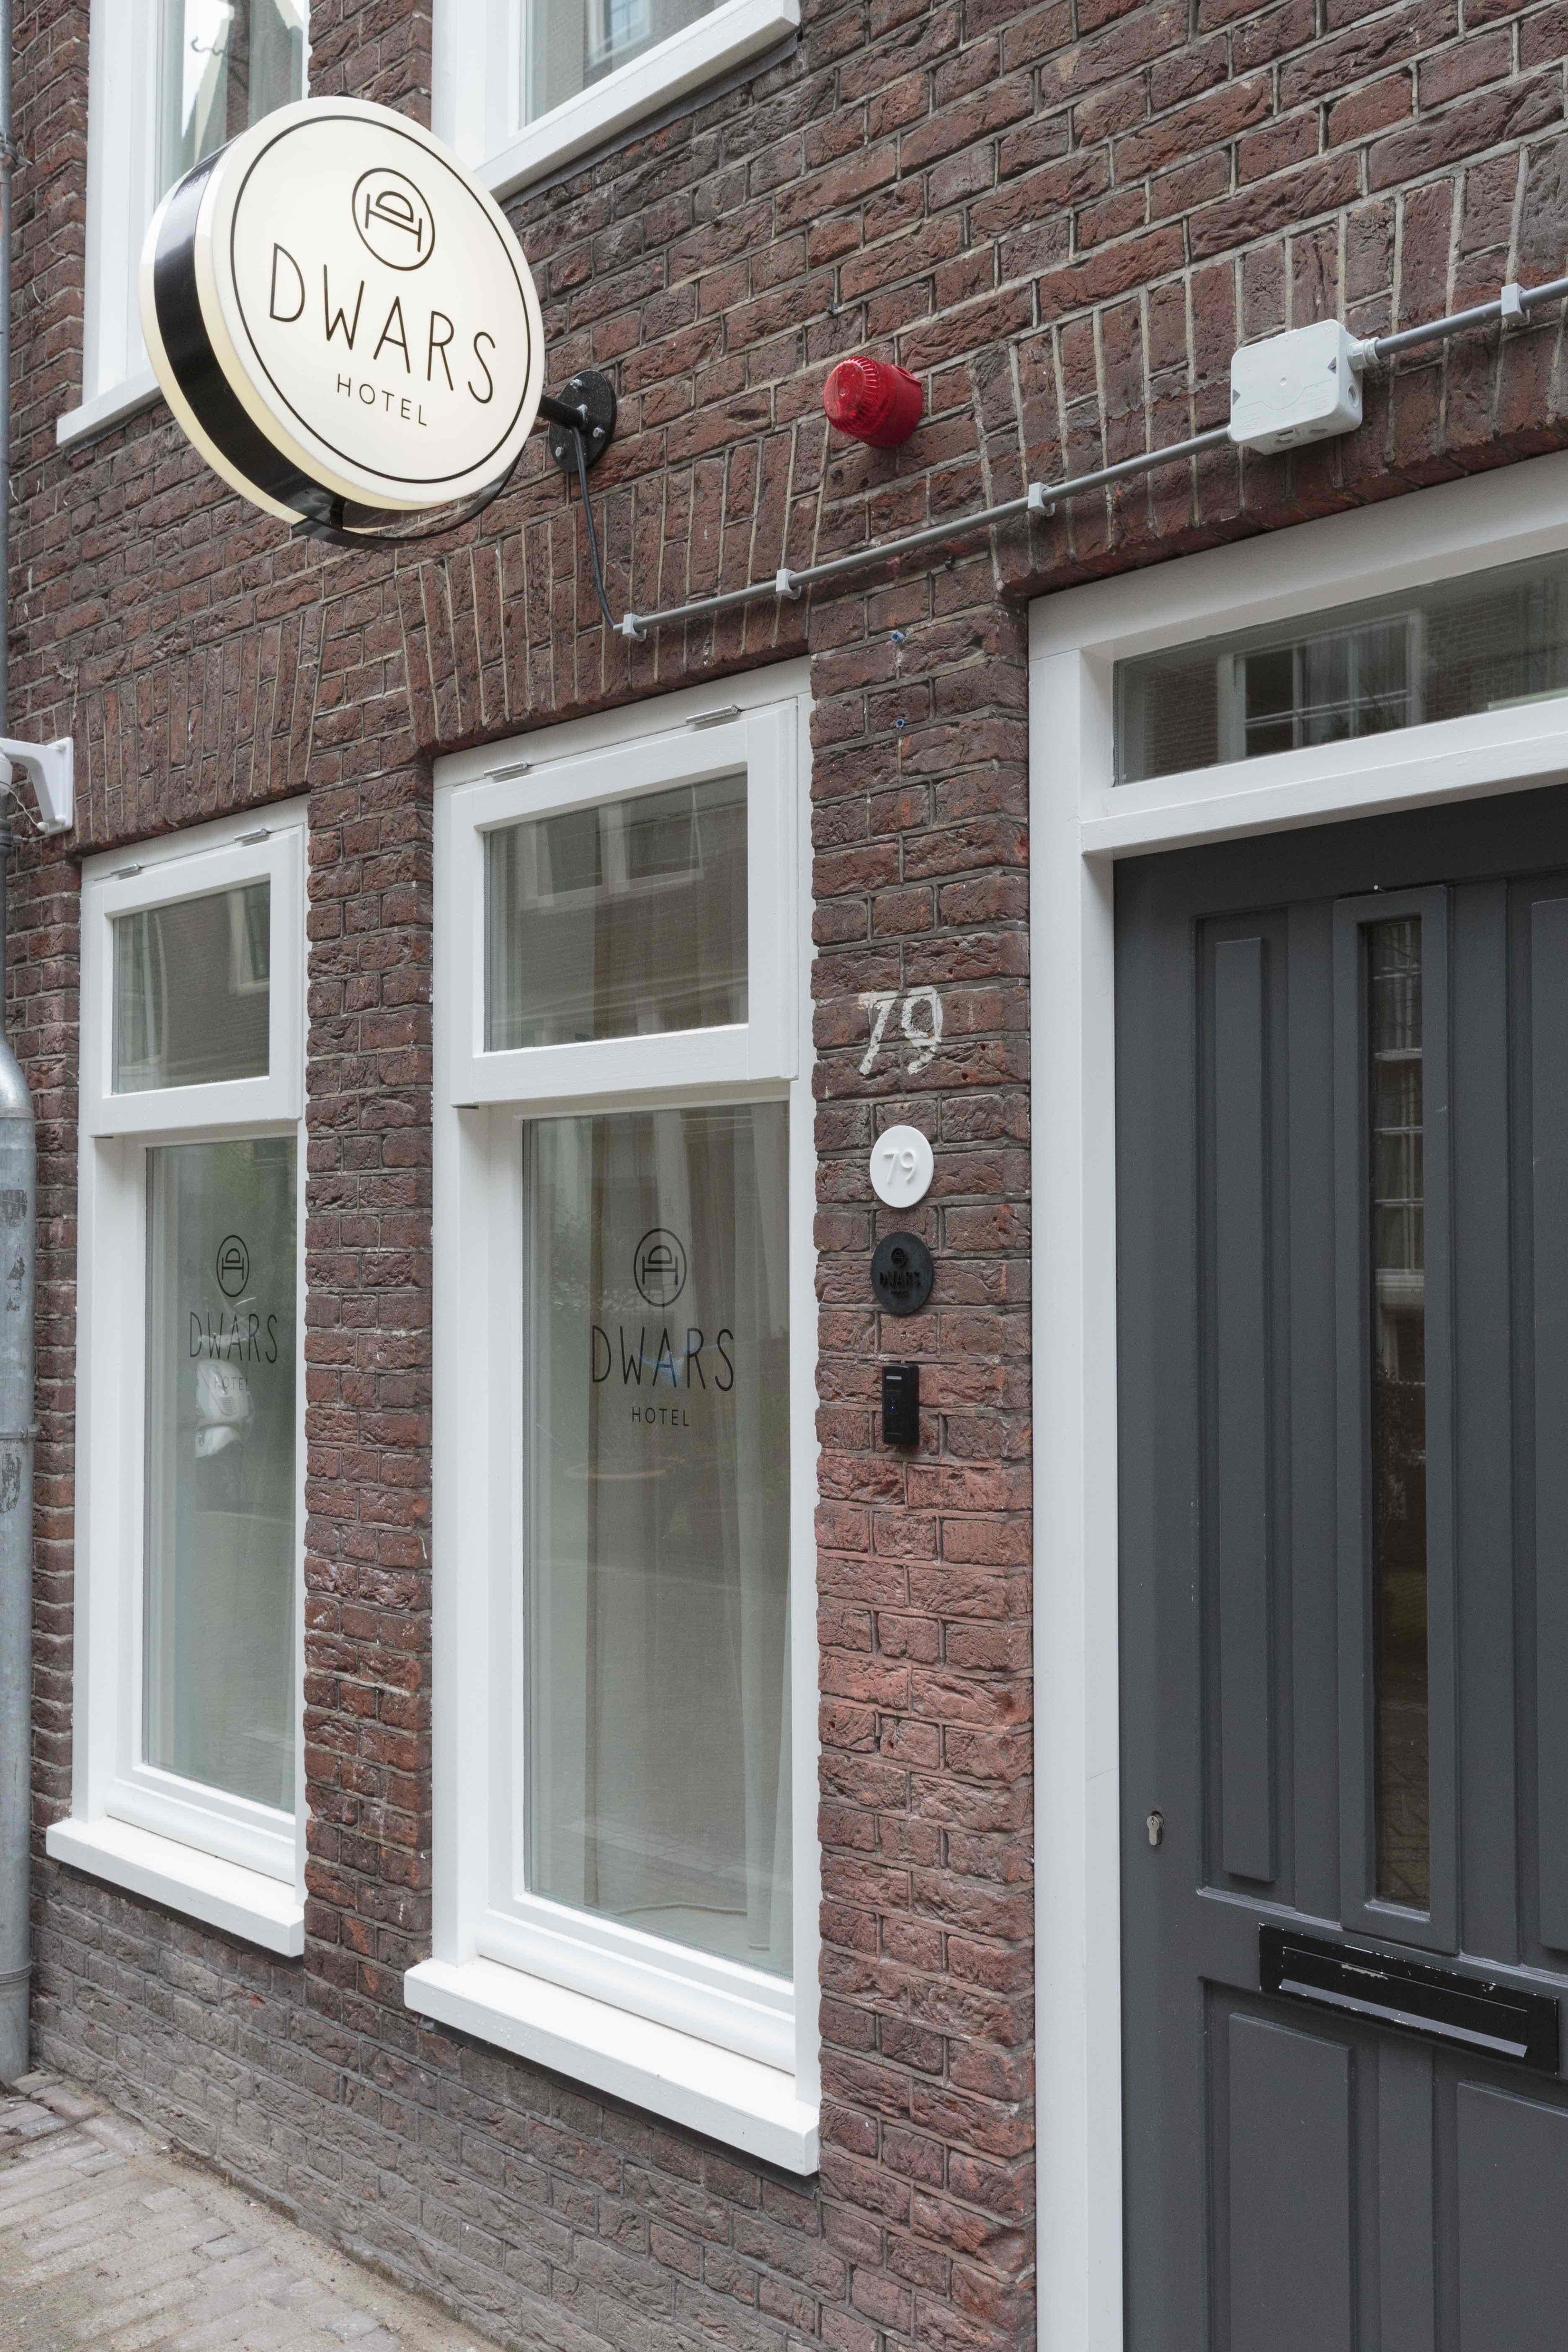 HOTEL DWARS 2013 AMSTERDAM